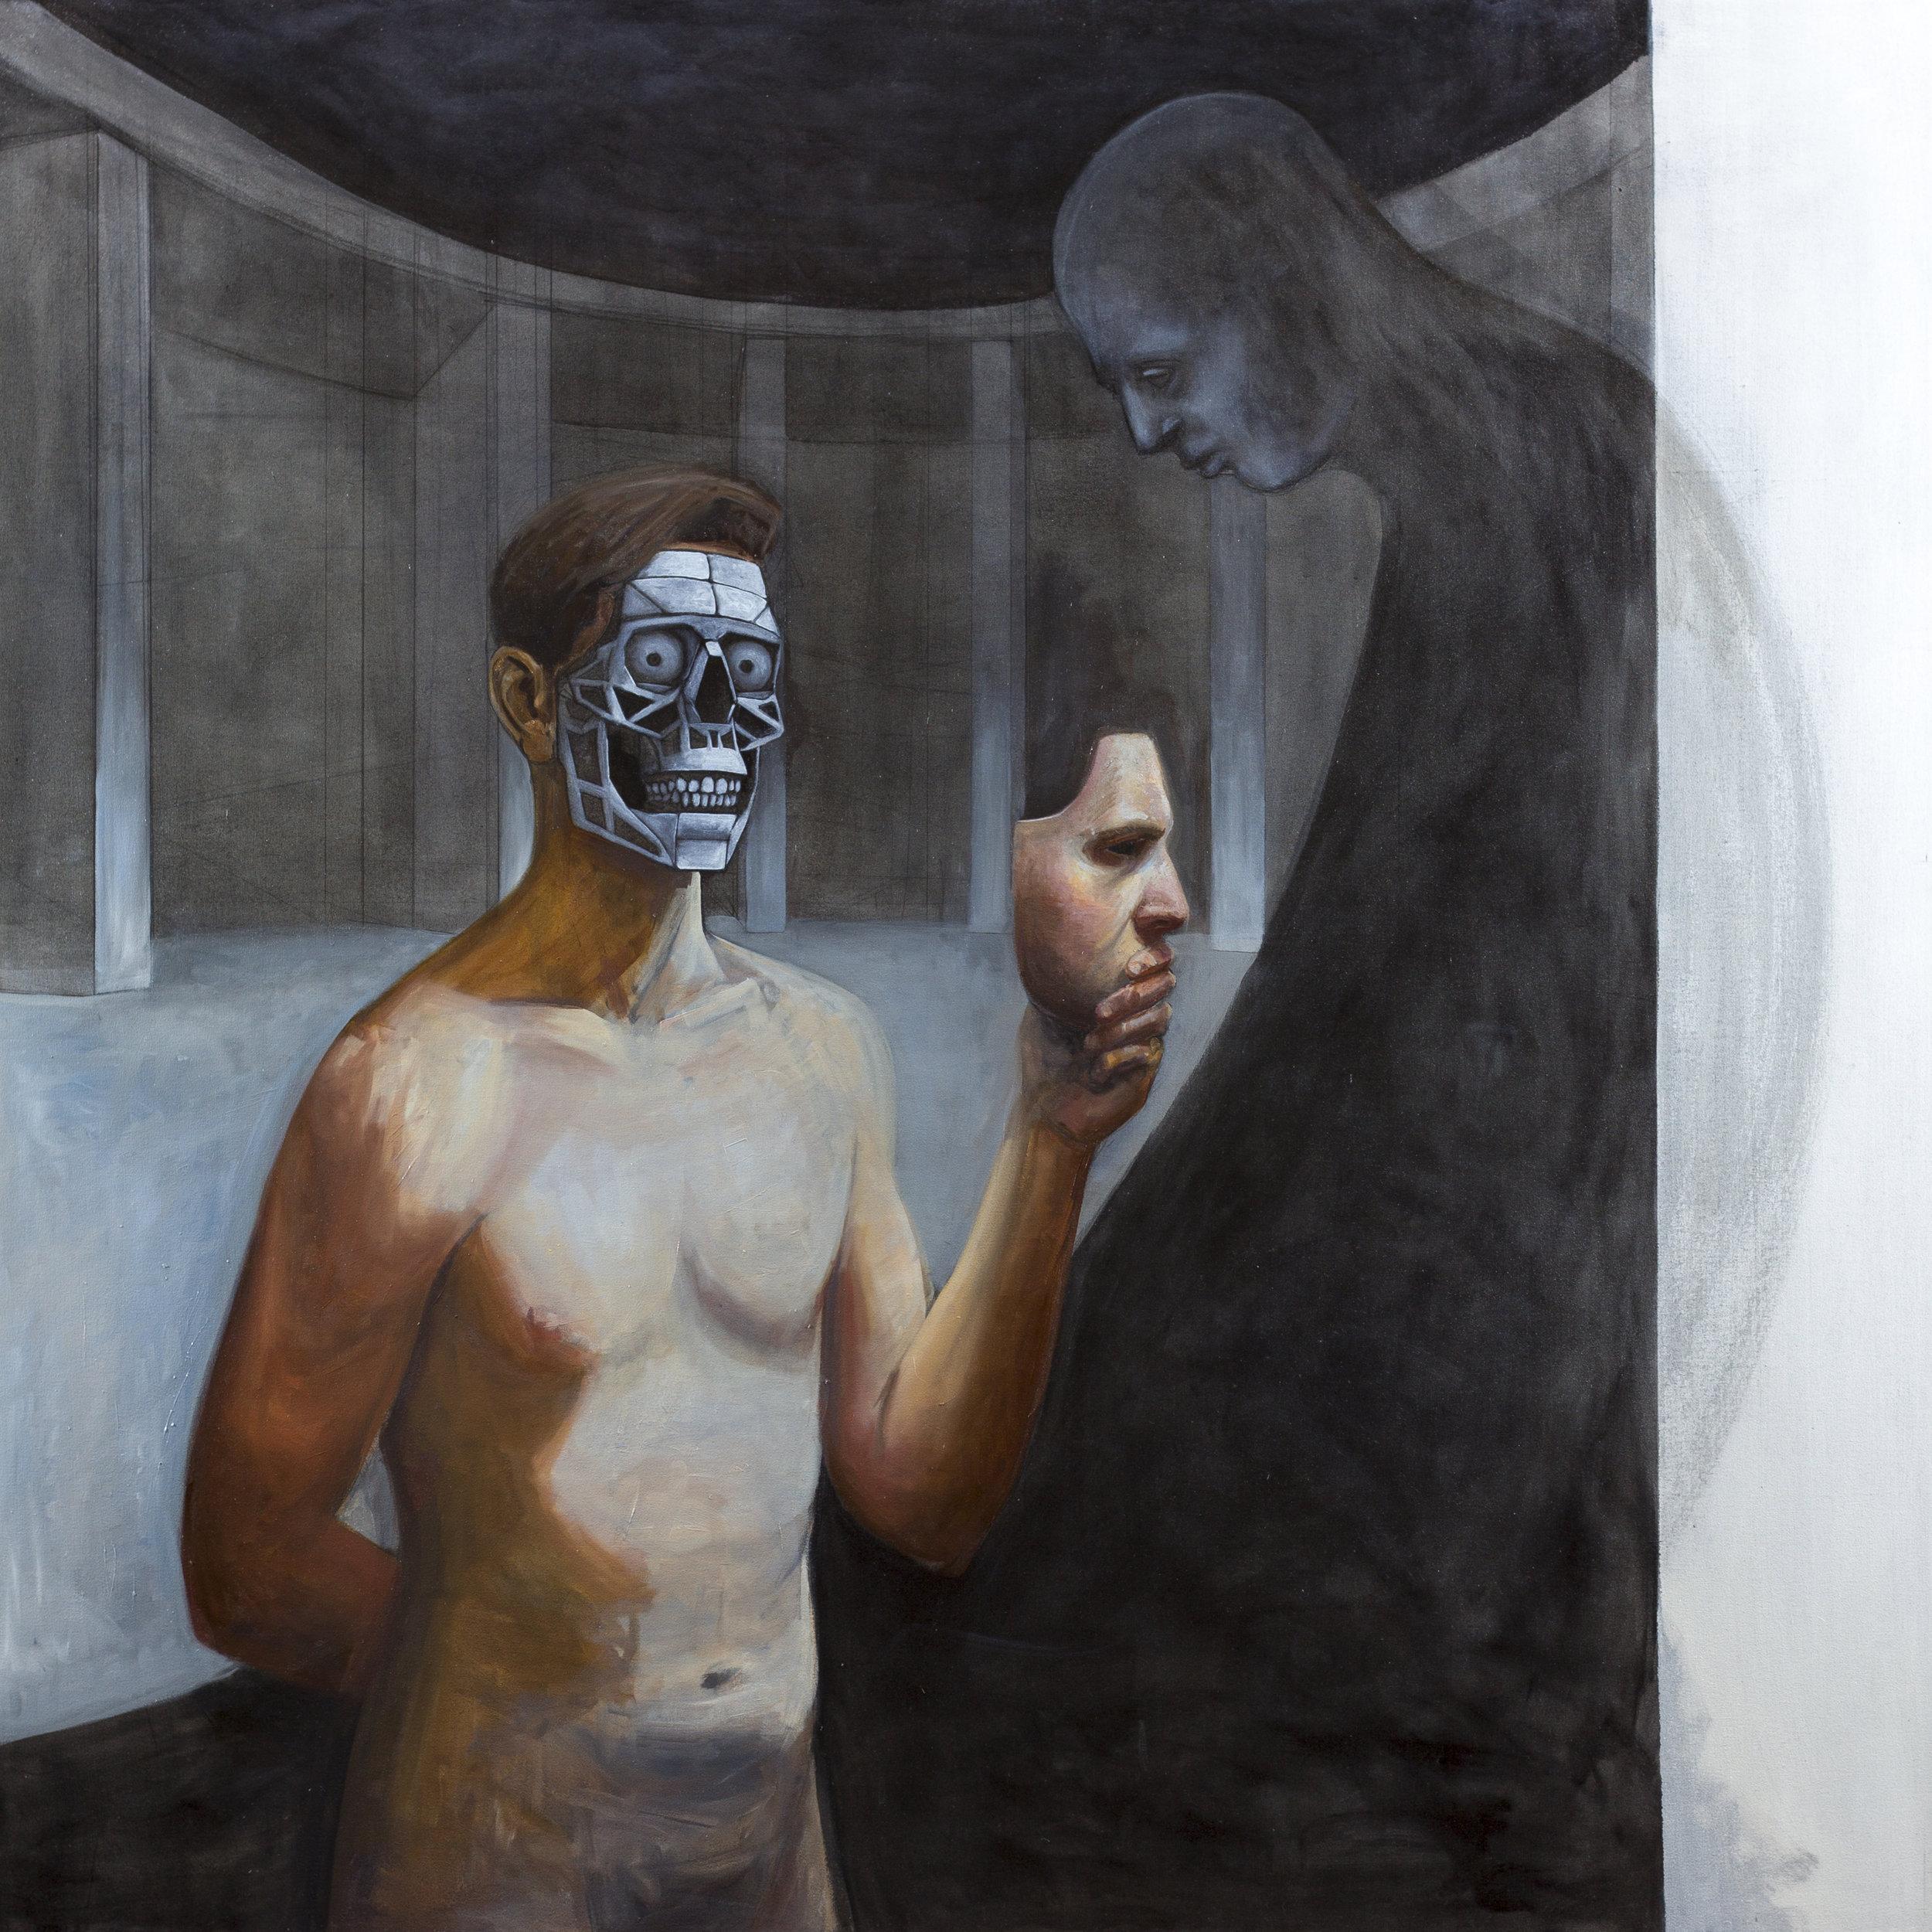 Gatekeeper III , 2019, charcoal & oil on canvas, 56 x 56 in